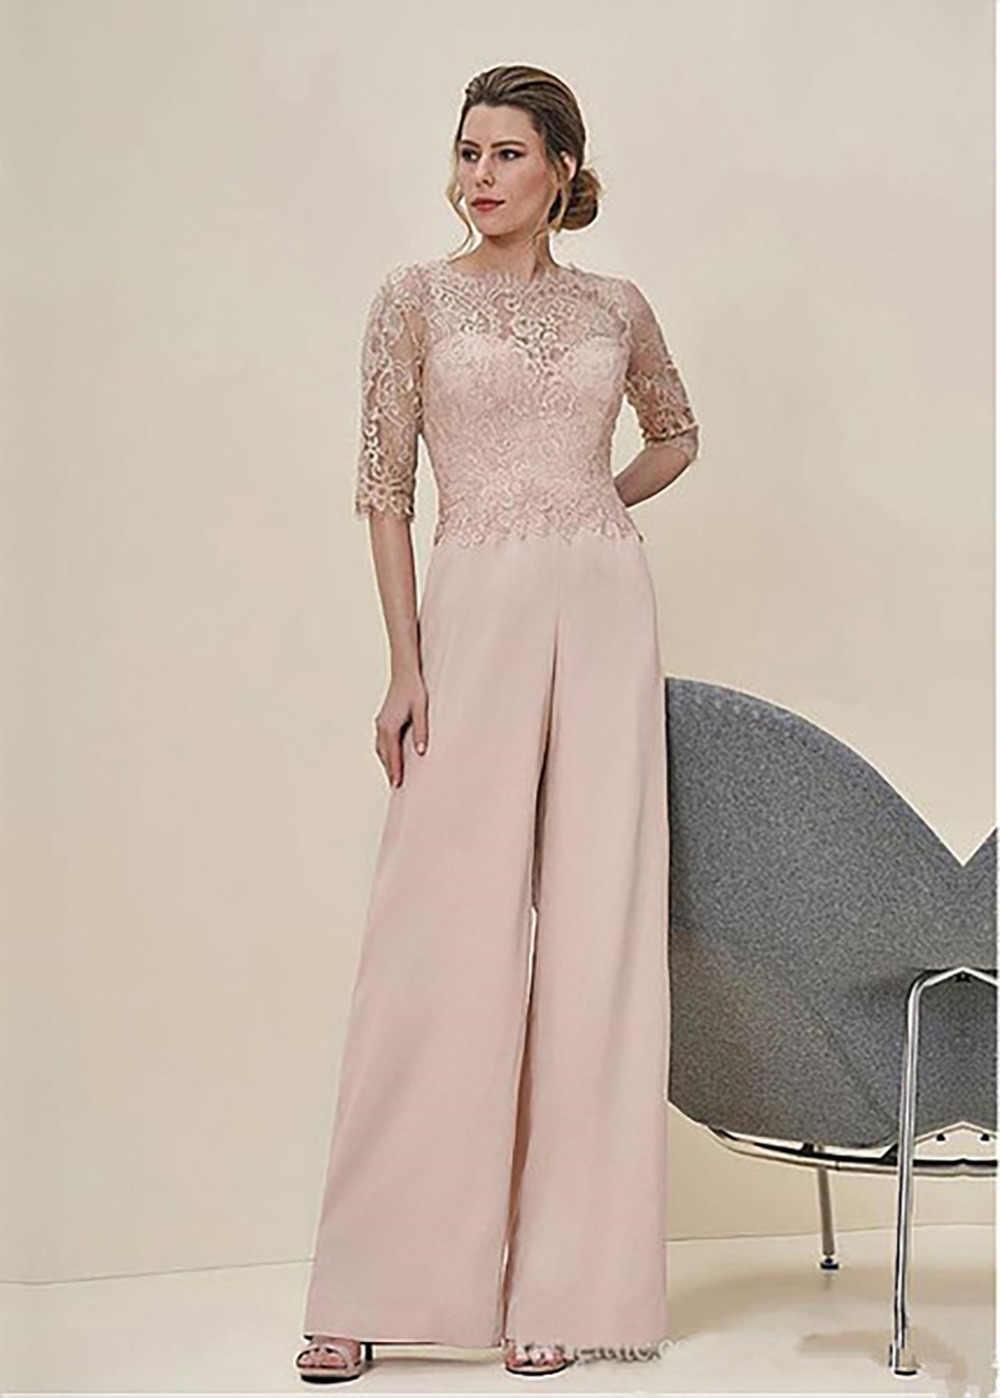 e930b3d6144 New Arrival 2018 Jumpsuits Lace Pastel Half Sleeves Elegant Wedding Guest  Dress Zipper Back Long Mother